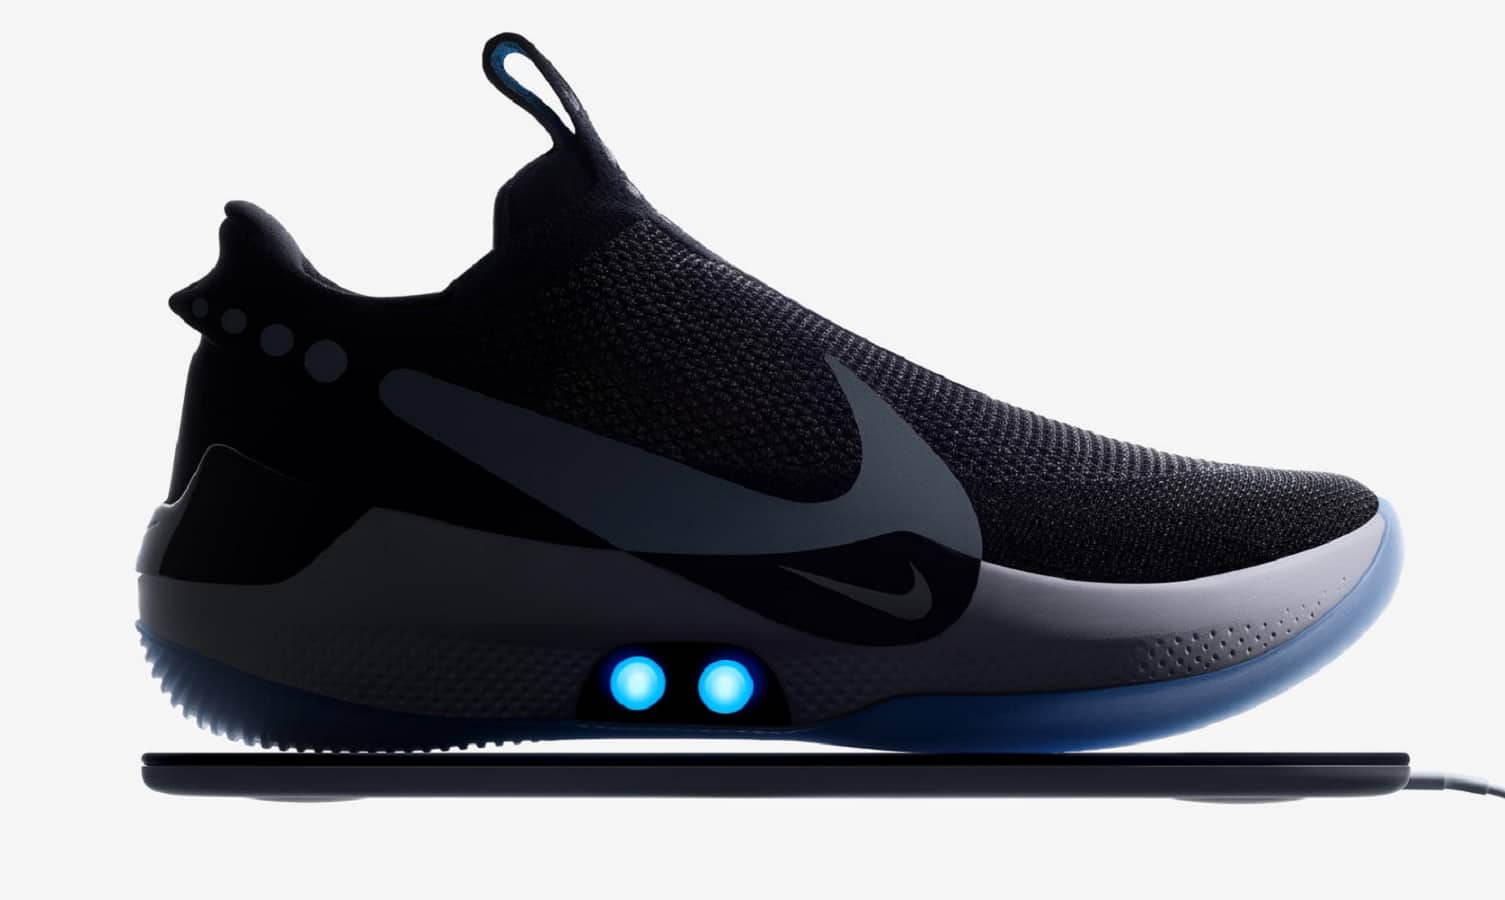 nike adapt bb self-lacing shoe